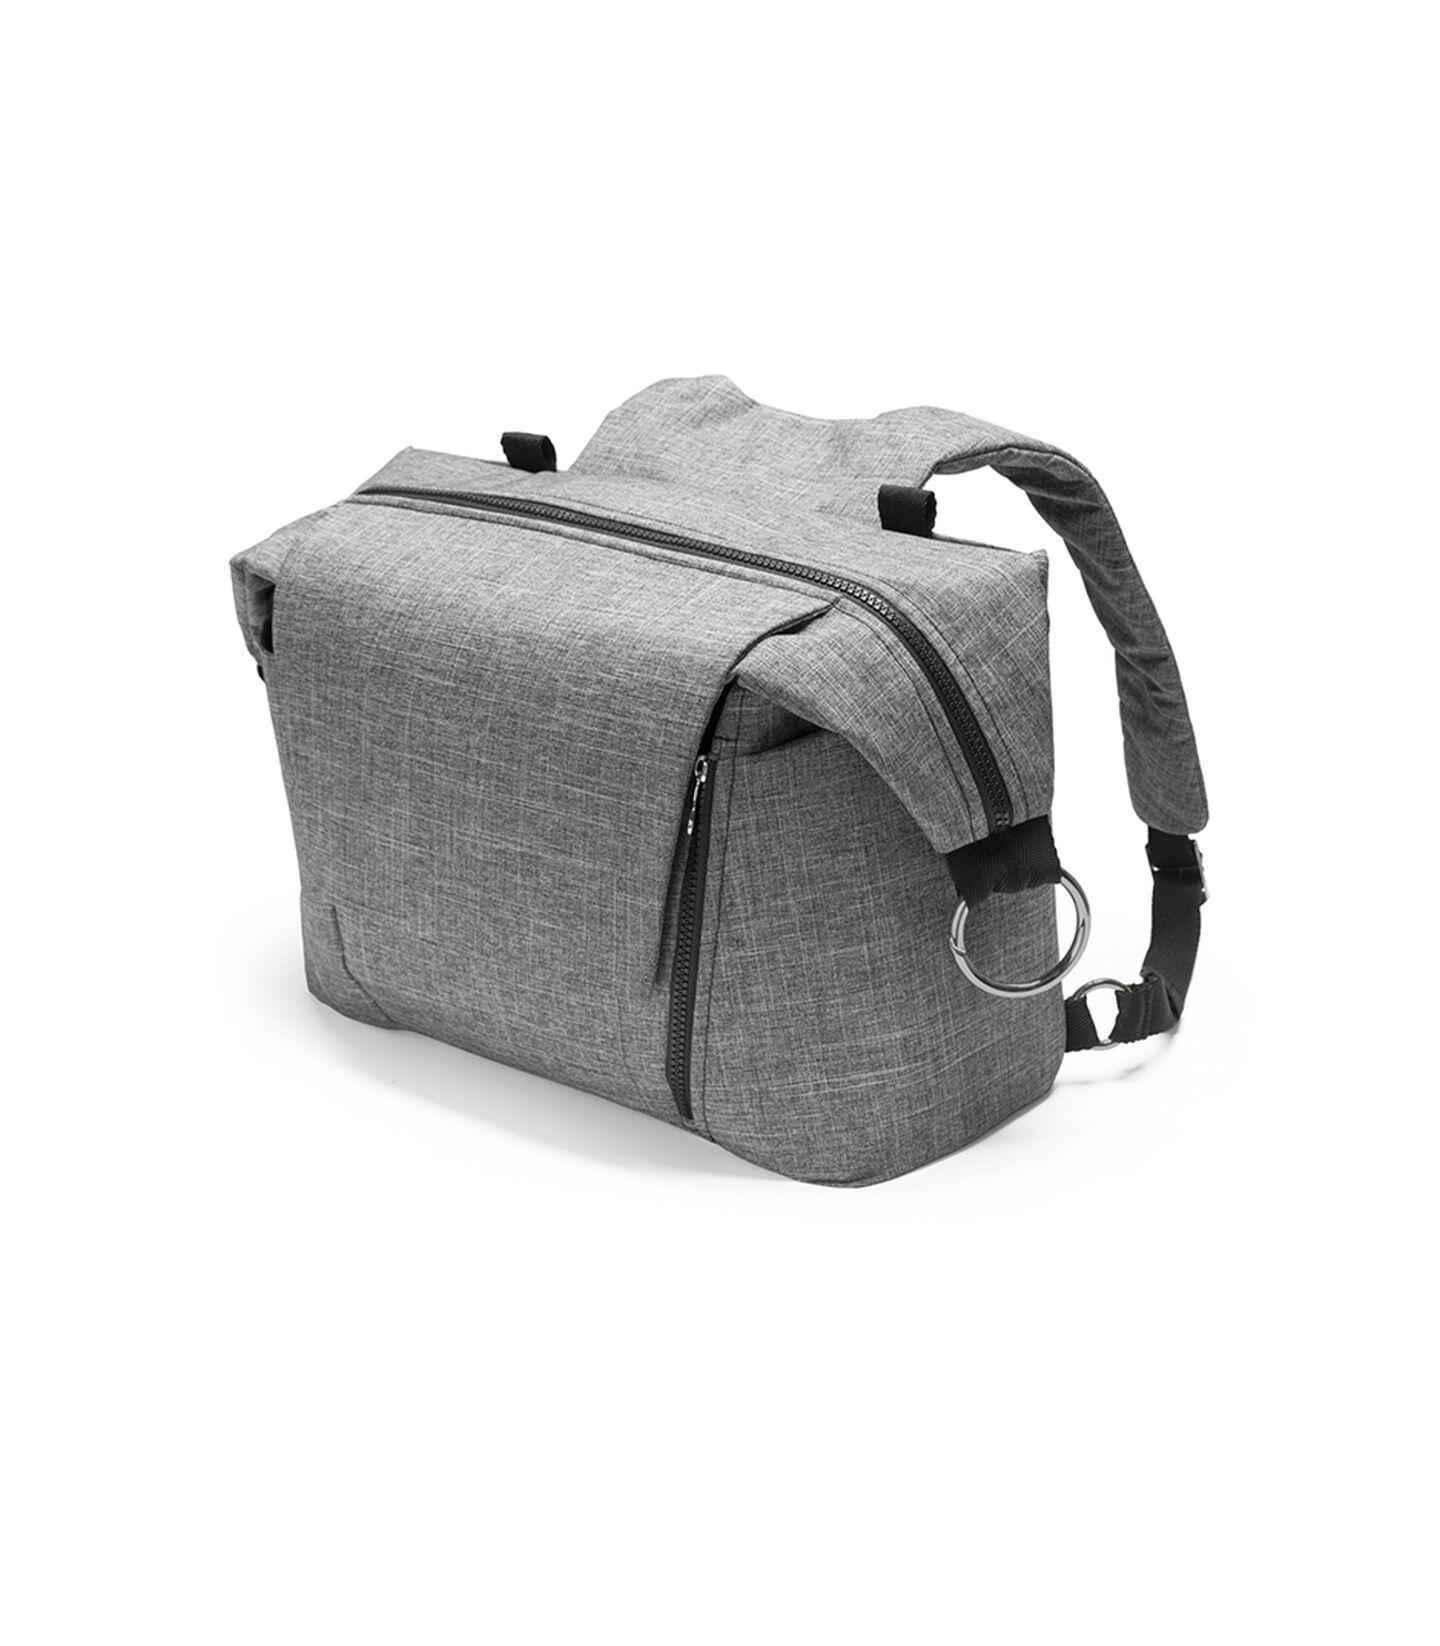 Stokke® Changing Bag Black Melange, Black Melange, mainview view 2